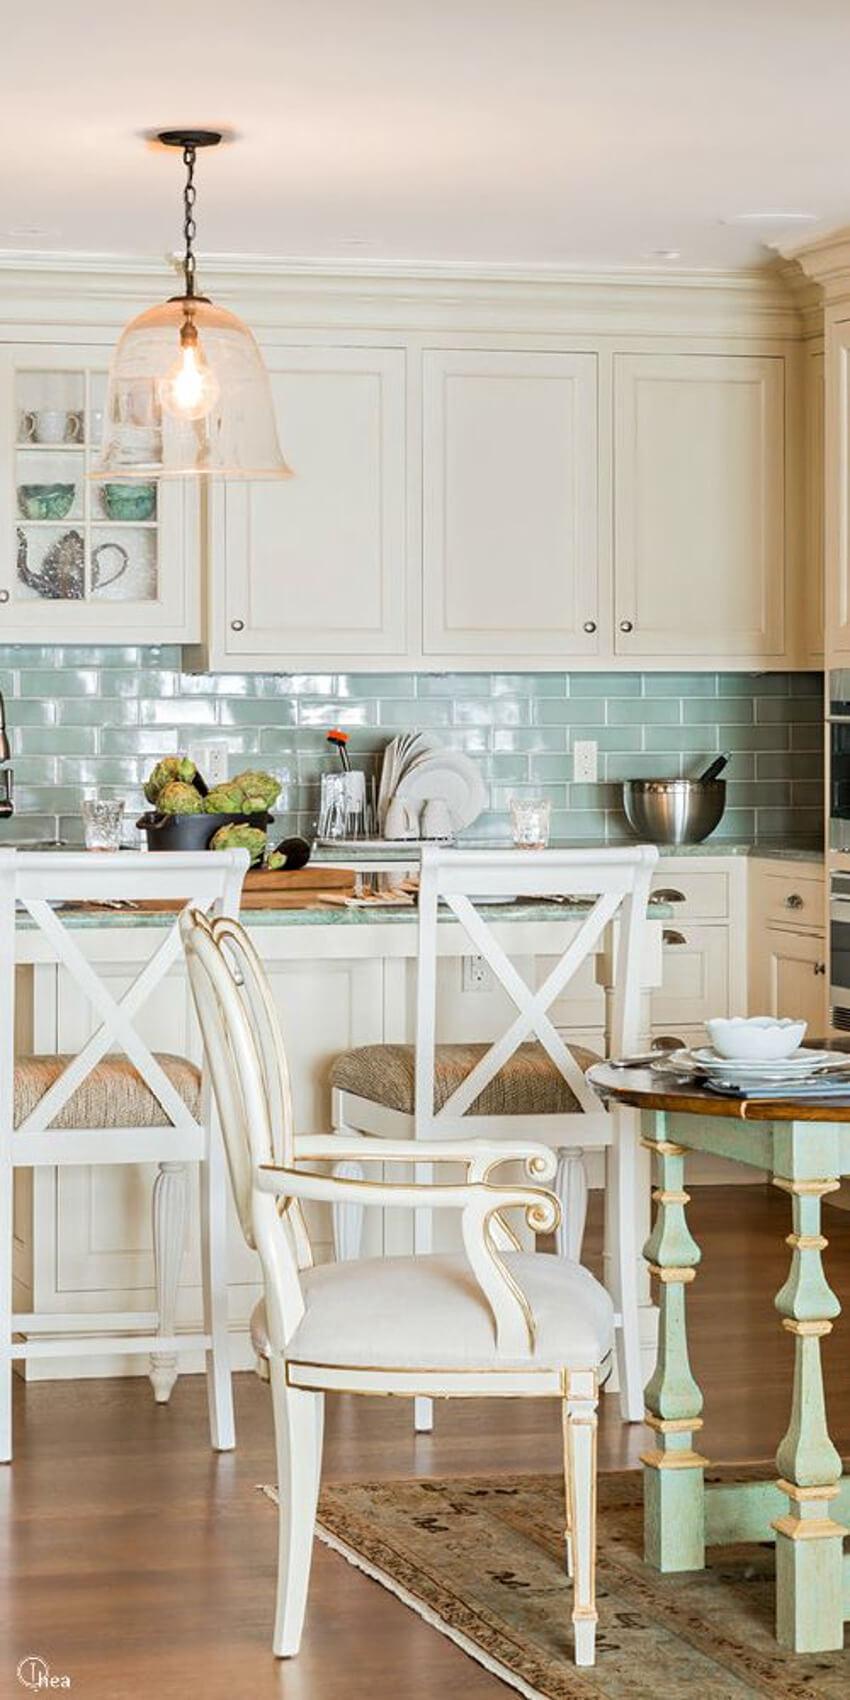 This blue translucent tile backsplash brings a pop of subtle color to this kitchen.